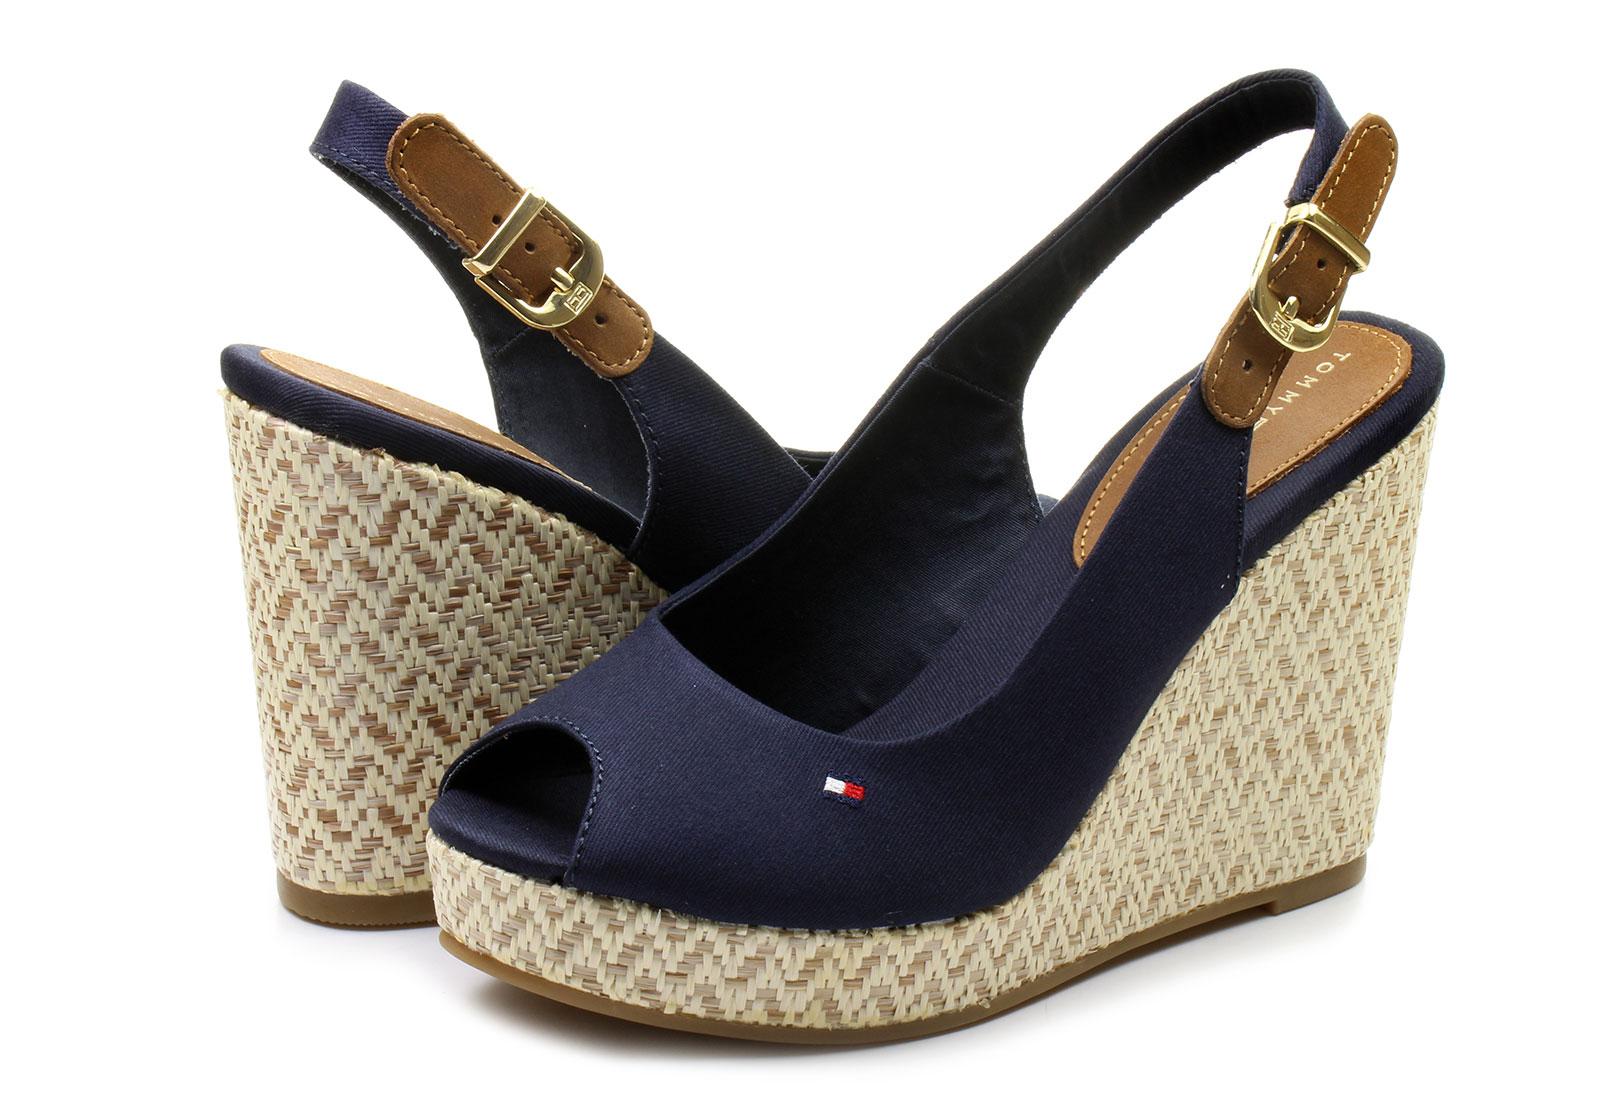 9562f8e047e Tommy Hilfiger Sandale - Elena 7d - 16S-0653-403 - Office Shoes Romania